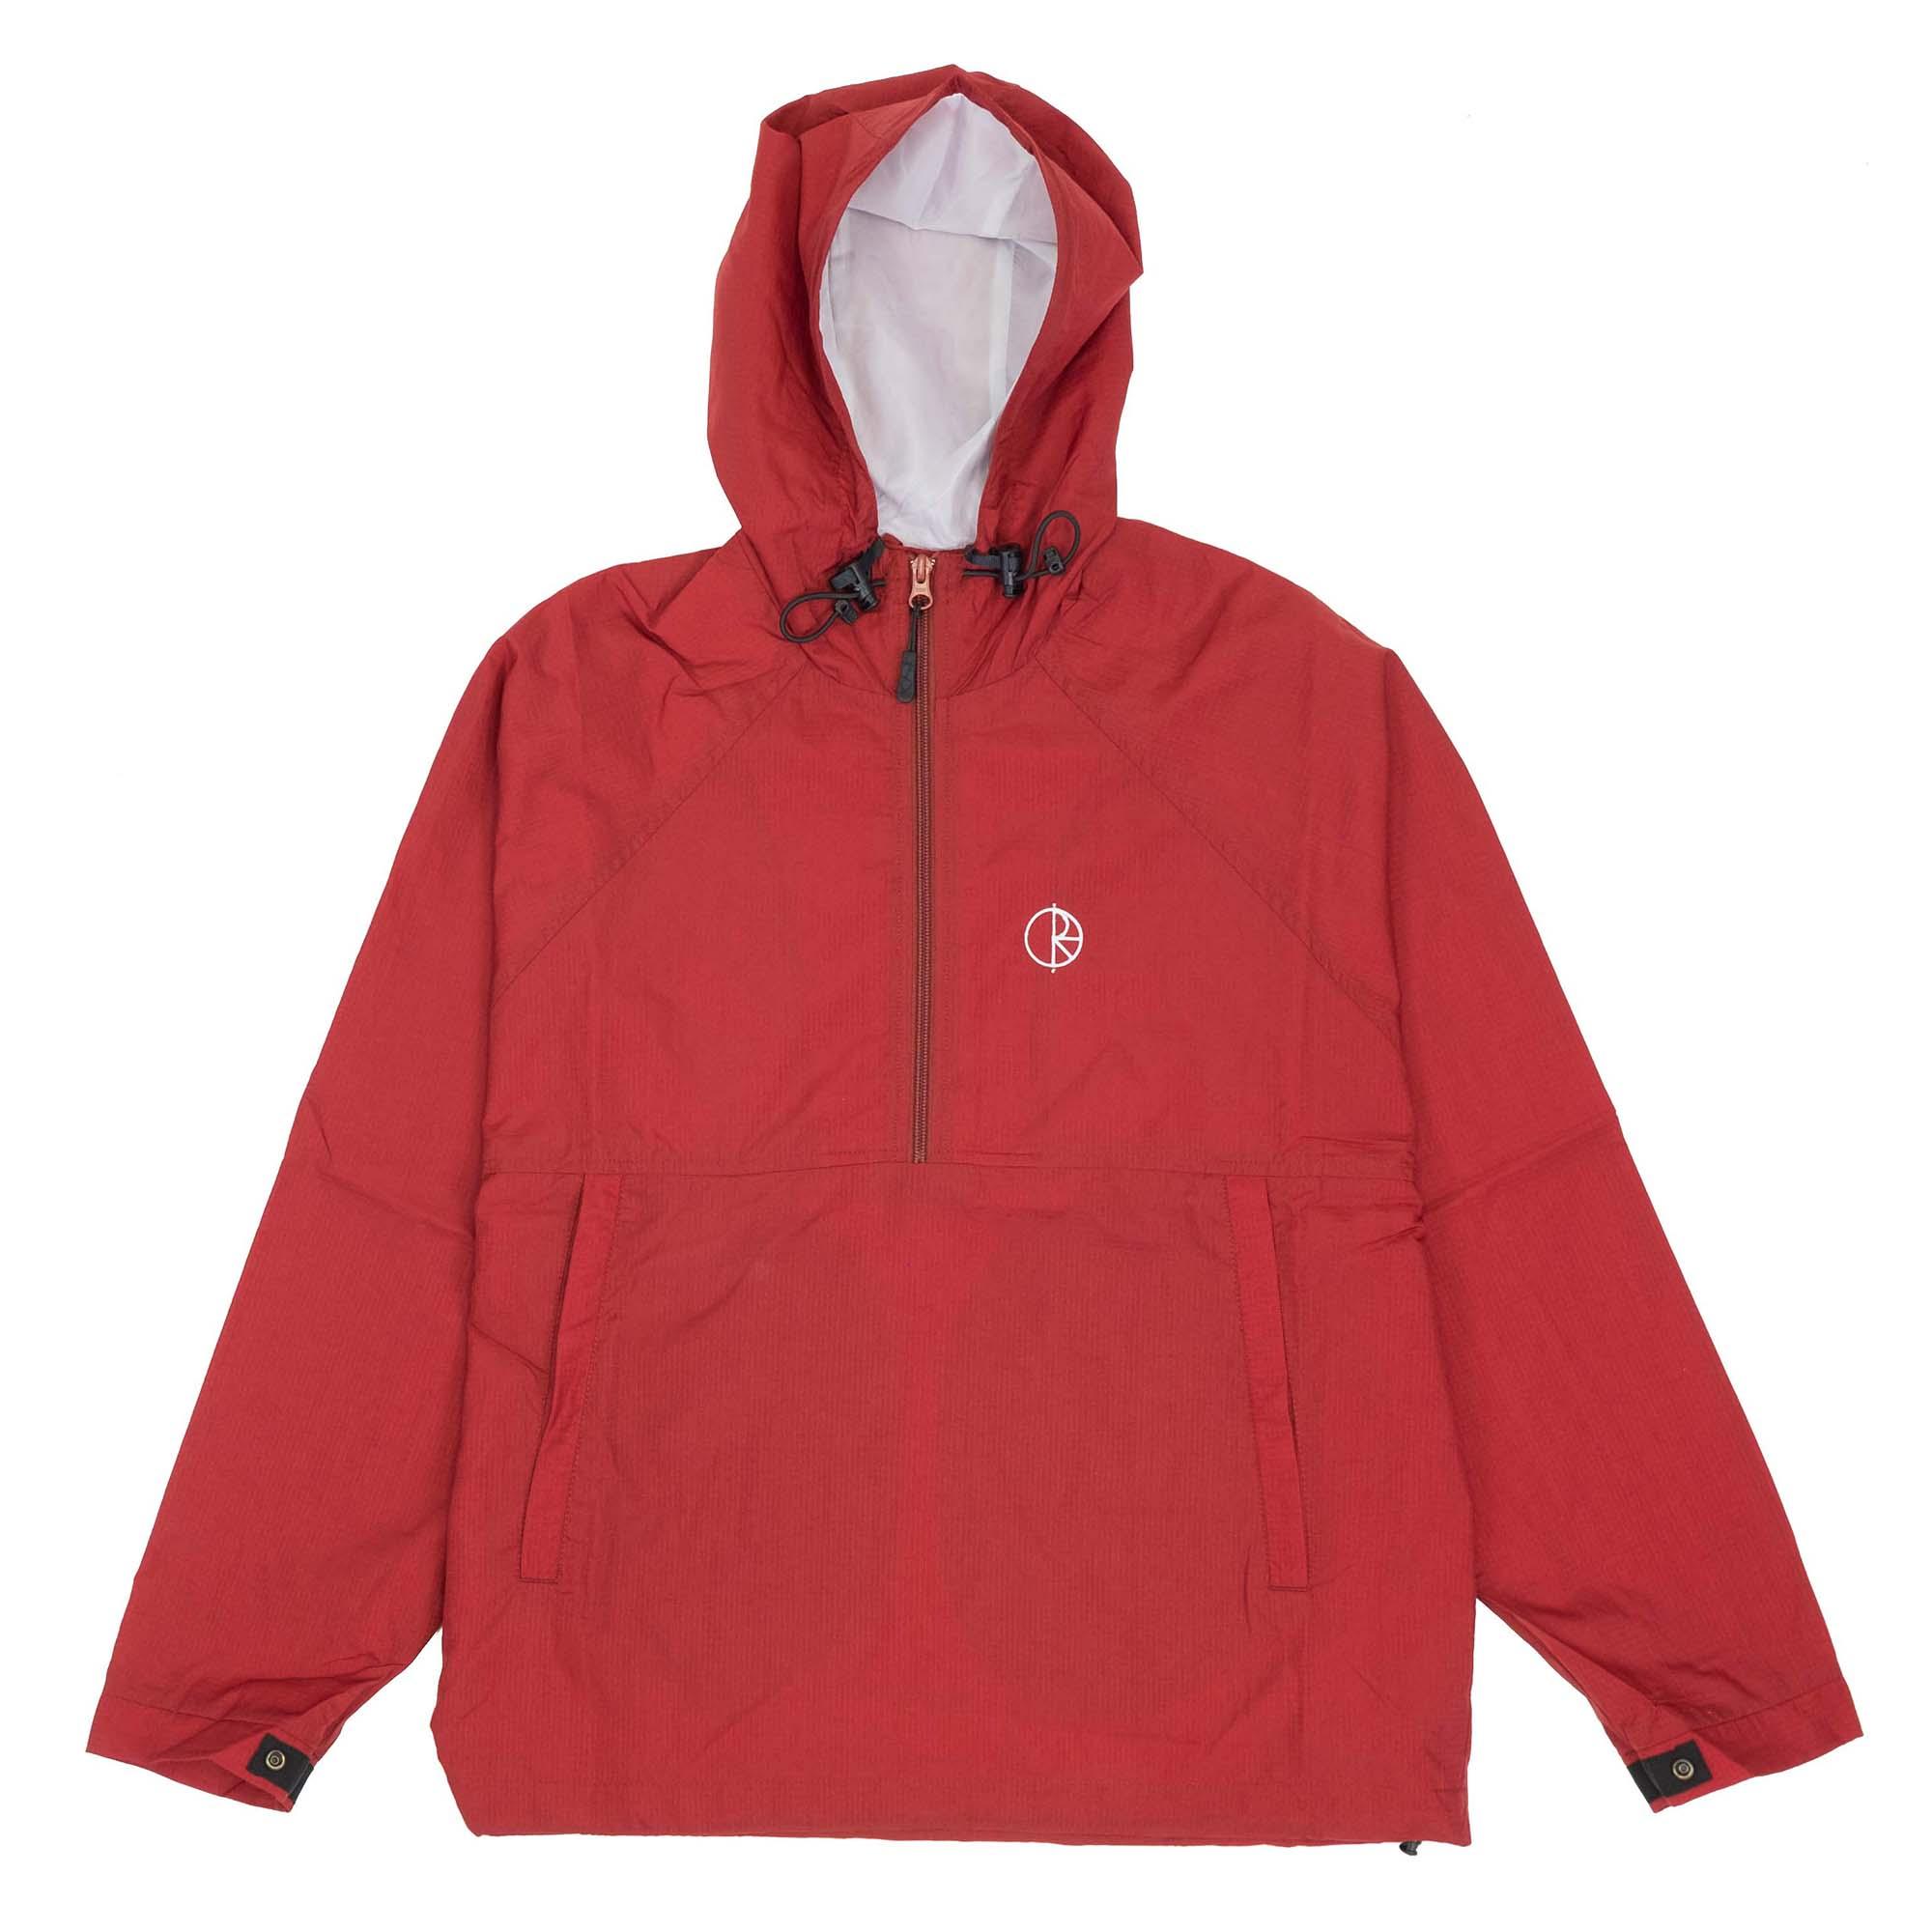 Polar Skate Co. Ripstop Anorak Jacket - Red